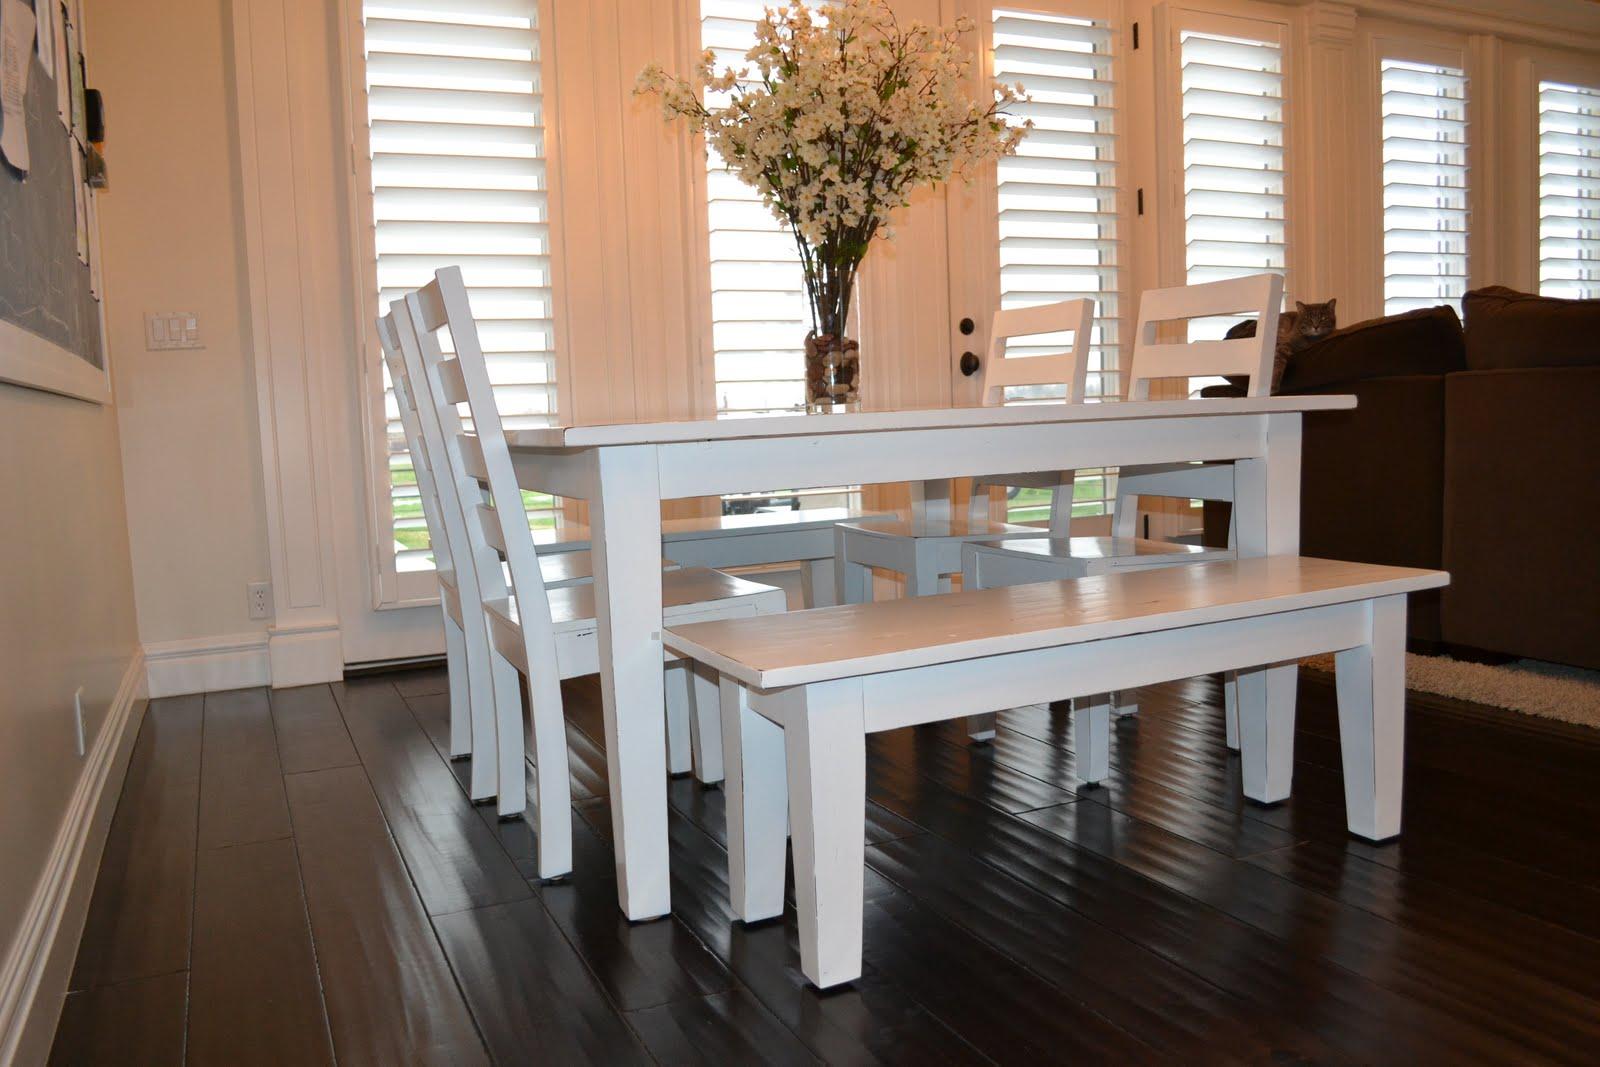 rachels kitchen table chairs redo redo kitchen table Rachel s Kitchen Table Chairs ReDO